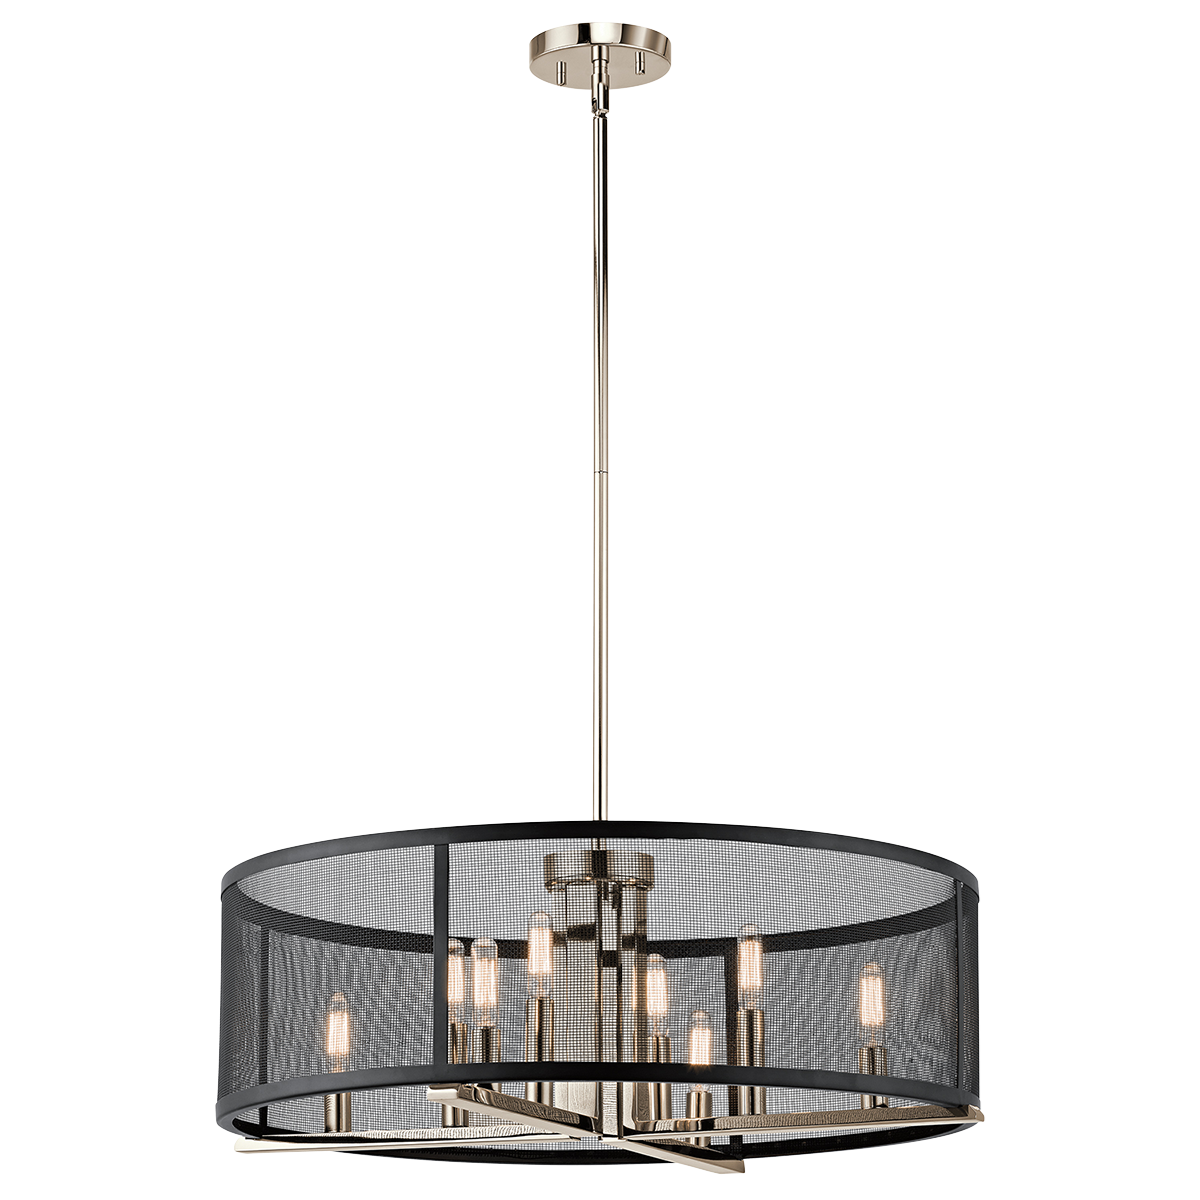 Titus 8 light chandelierpendant polished nickel dining room titus 8 light chandelierpendant polished nickel arubaitofo Images